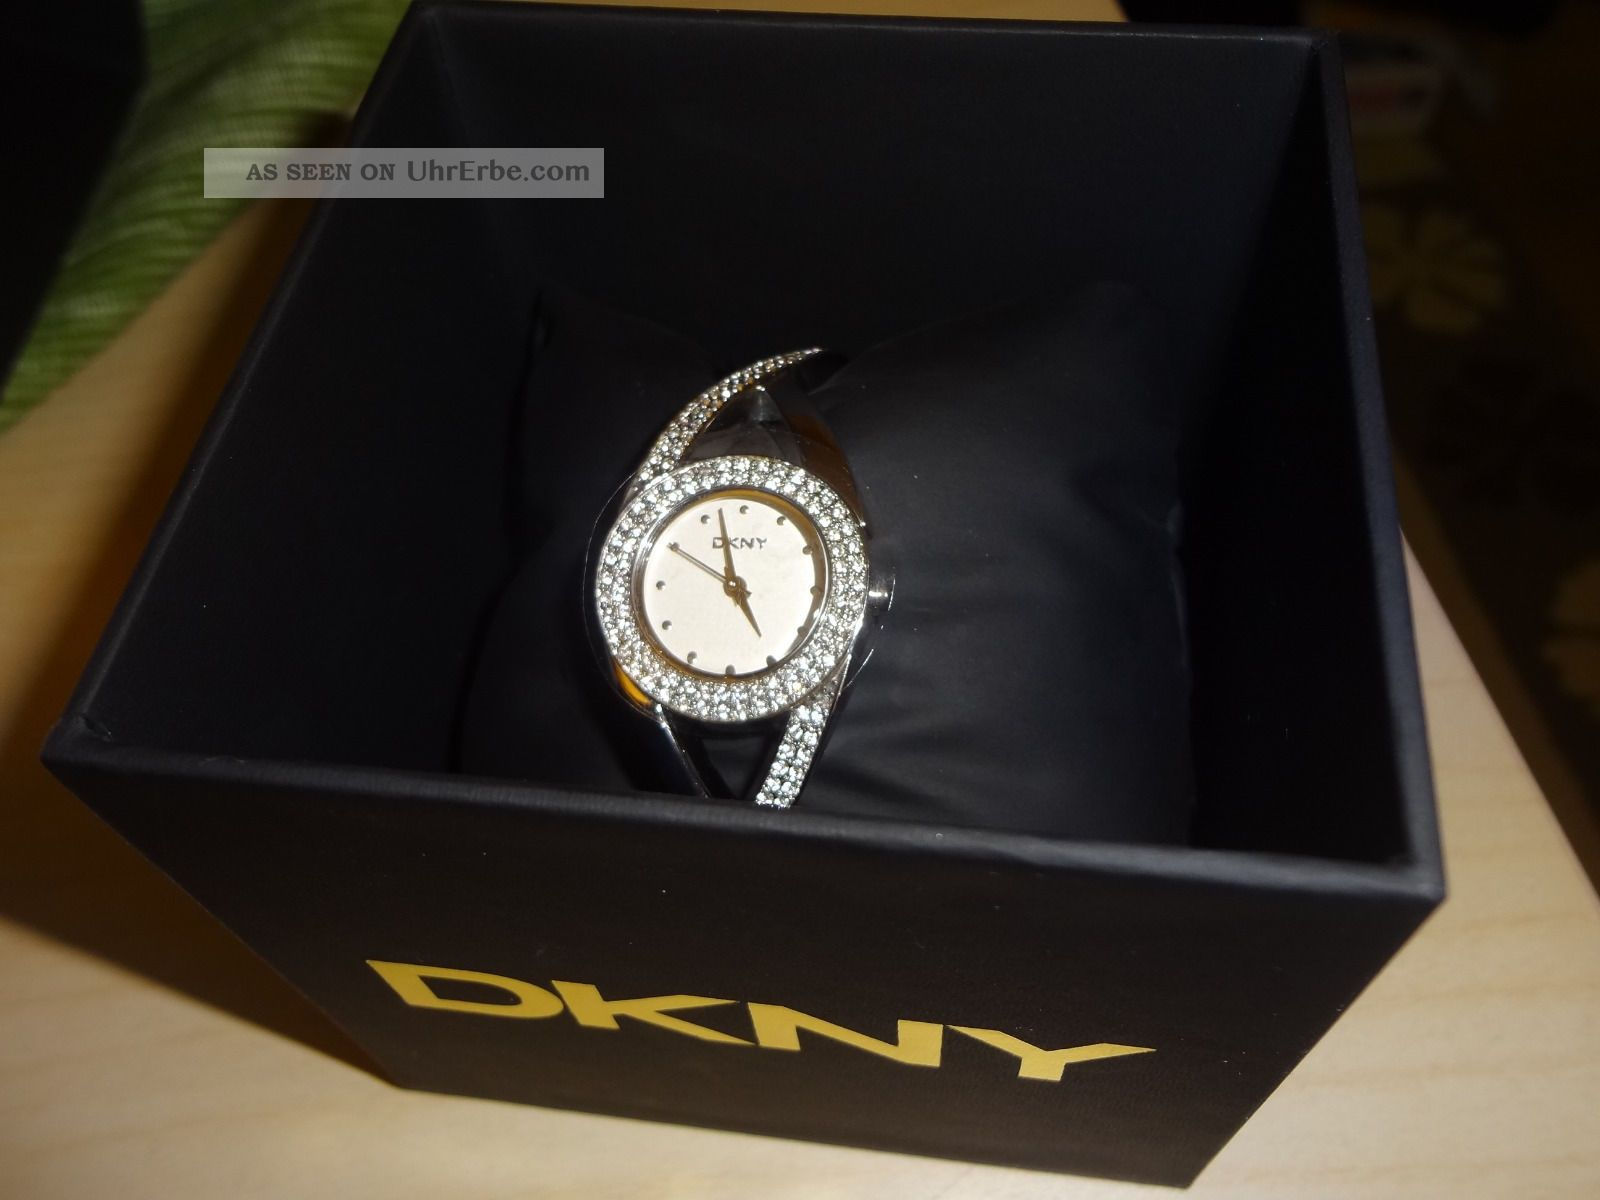 Damenuhr Dkny Armbanduhren Bild